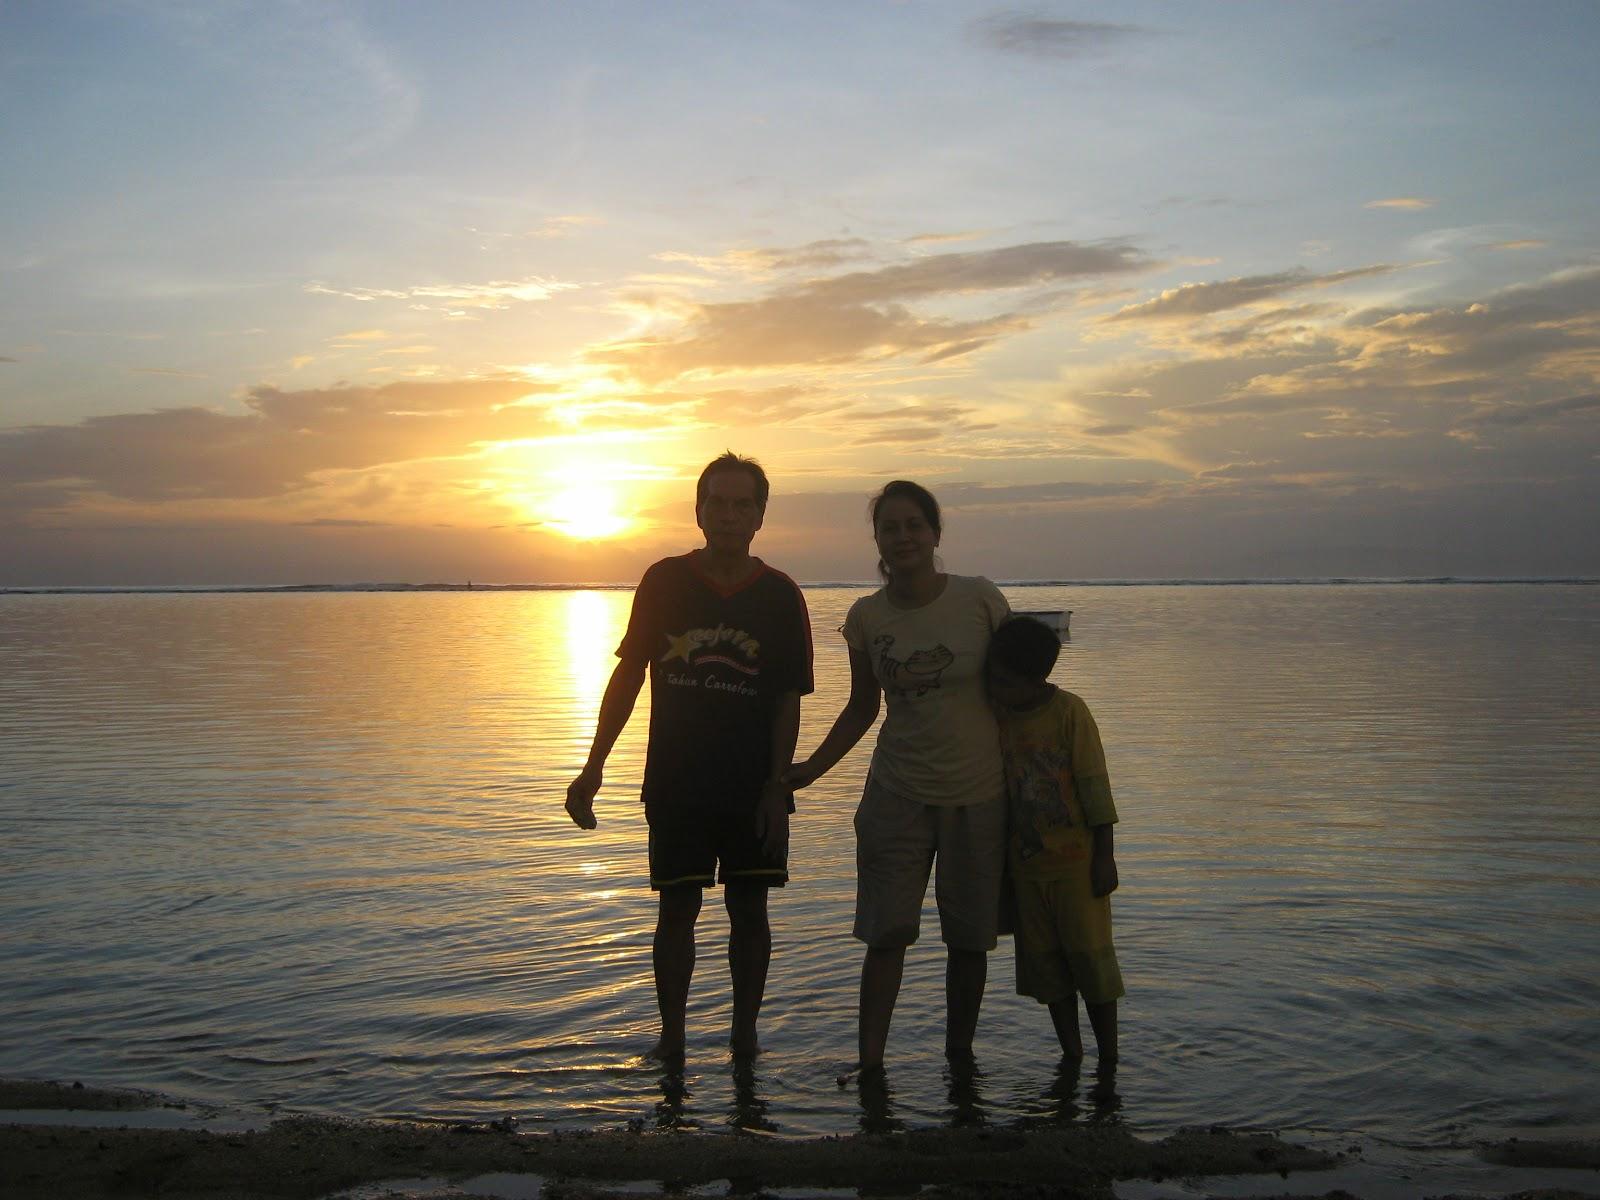 Bali Attractions Sunset at Sindu Beach